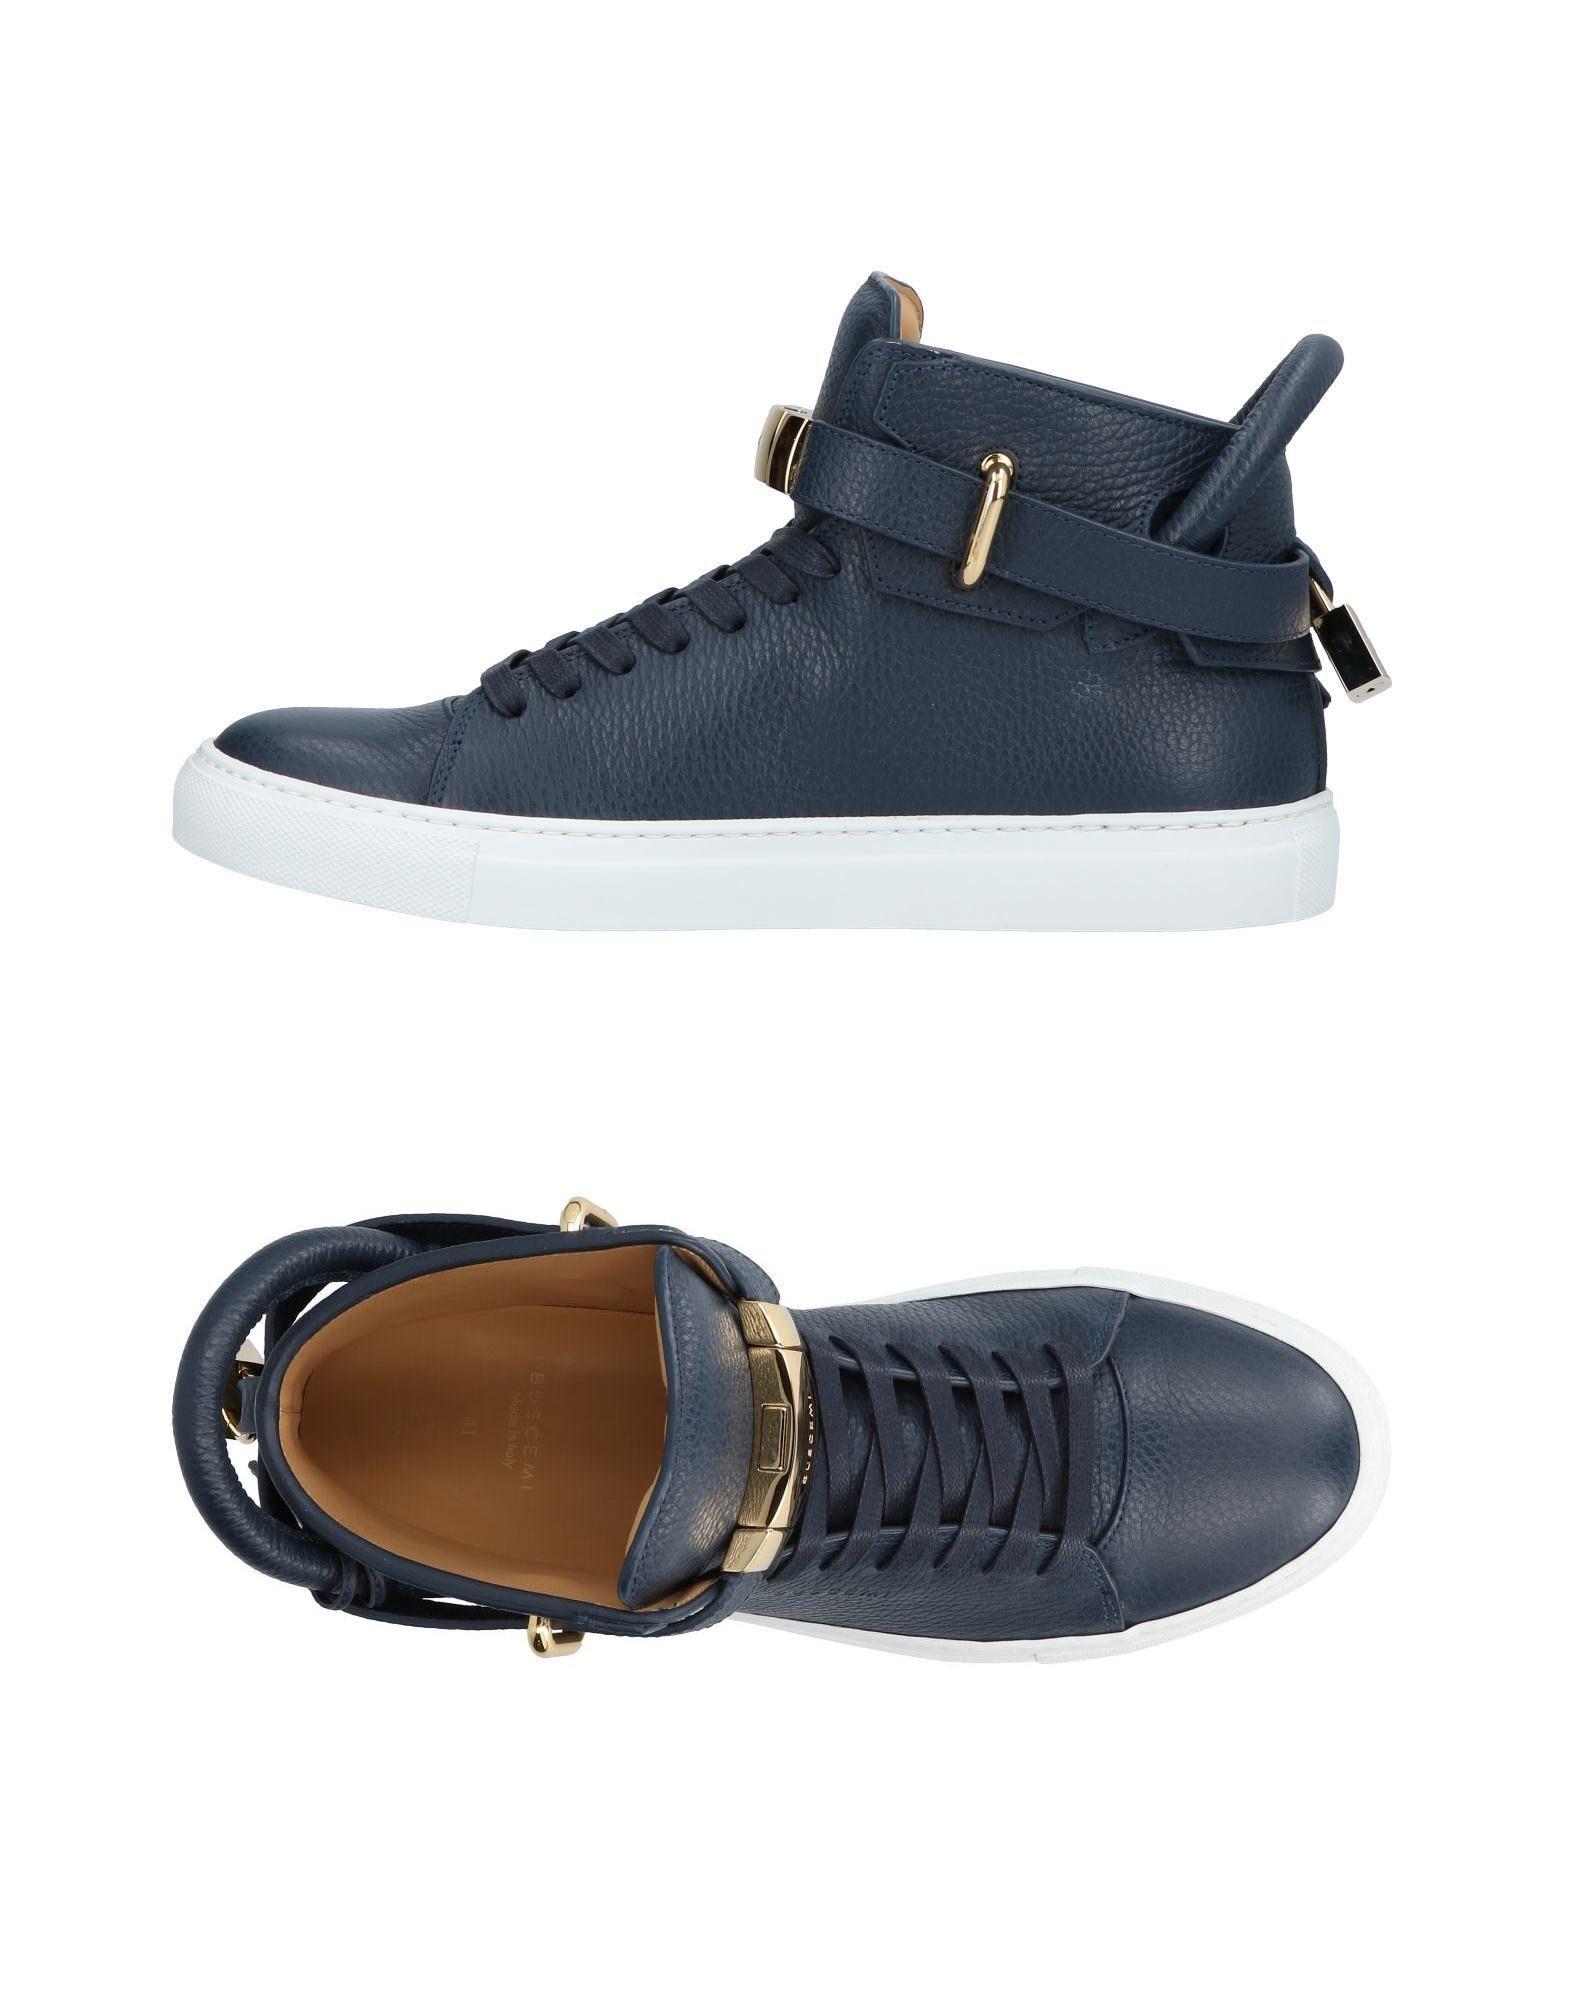 Buscemi Sneakers Herren  11426275DH Gute Qualität beliebte Schuhe